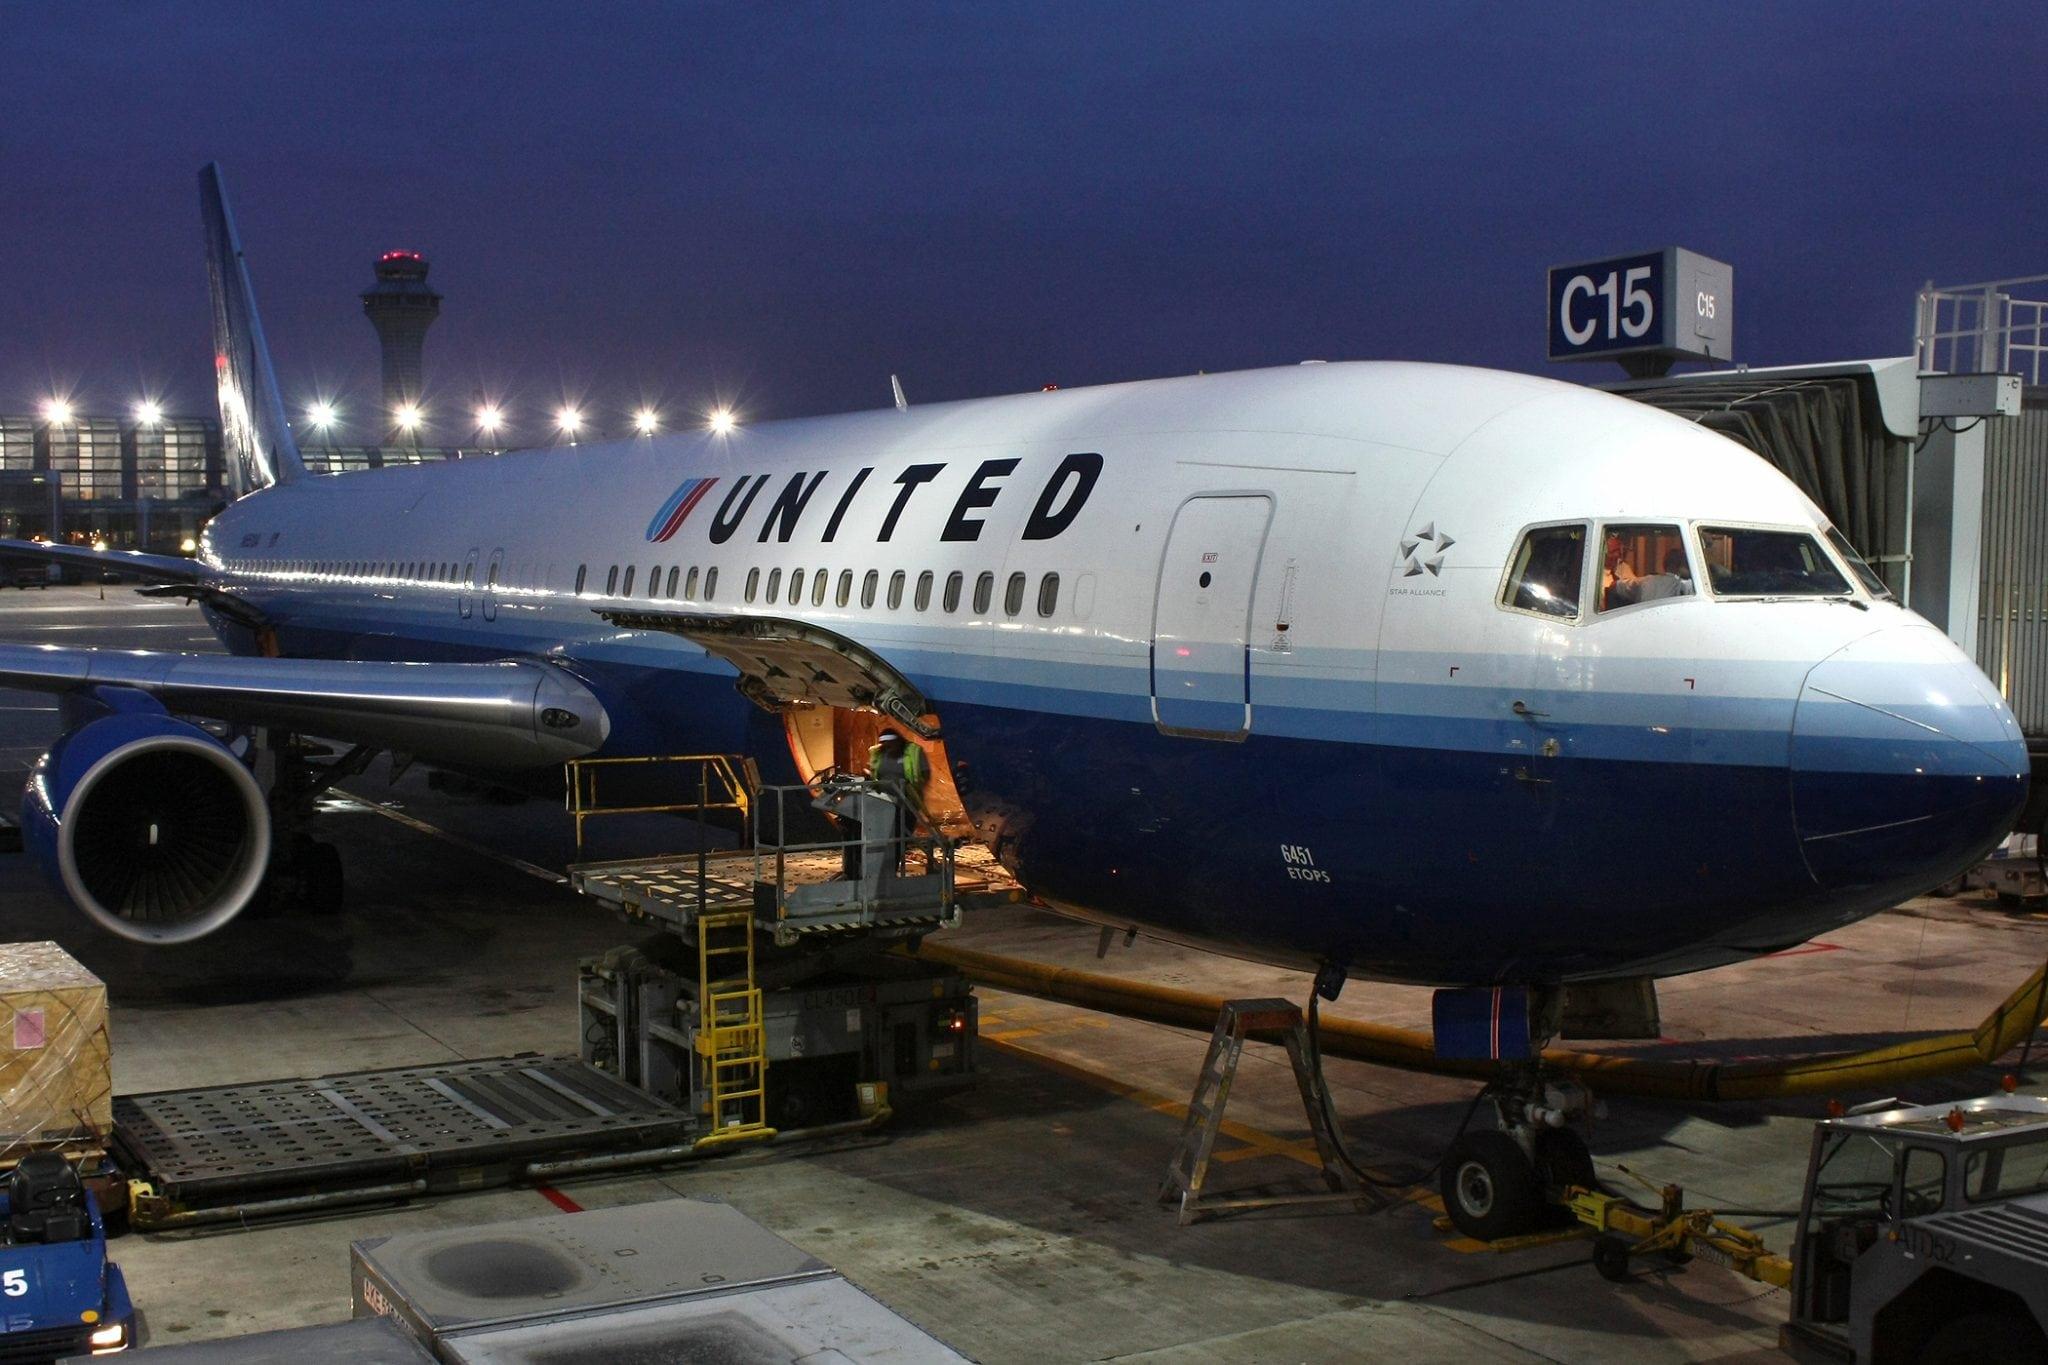 United sees a good Q1, looks to fleet renewal